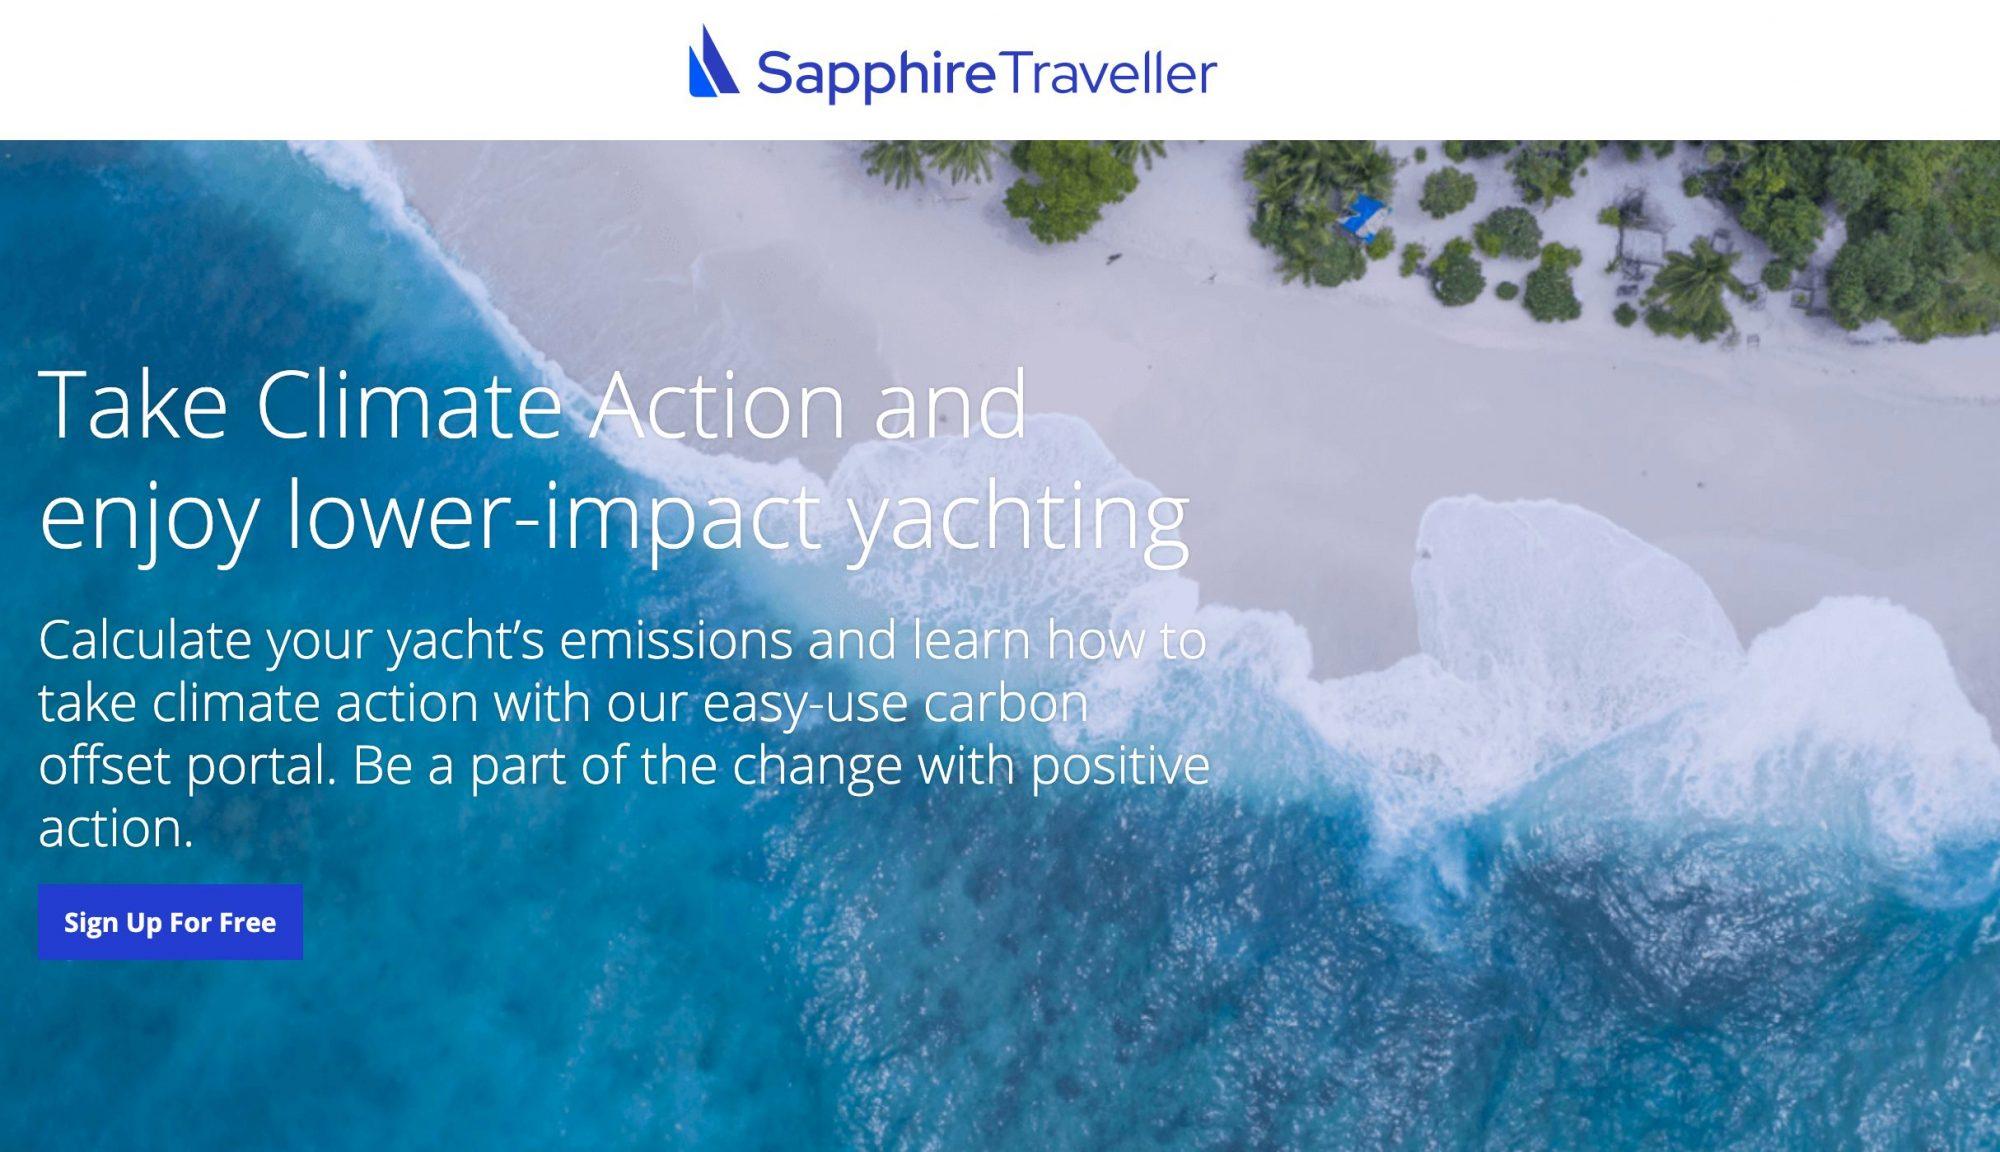 website header from Sapphire Traveller